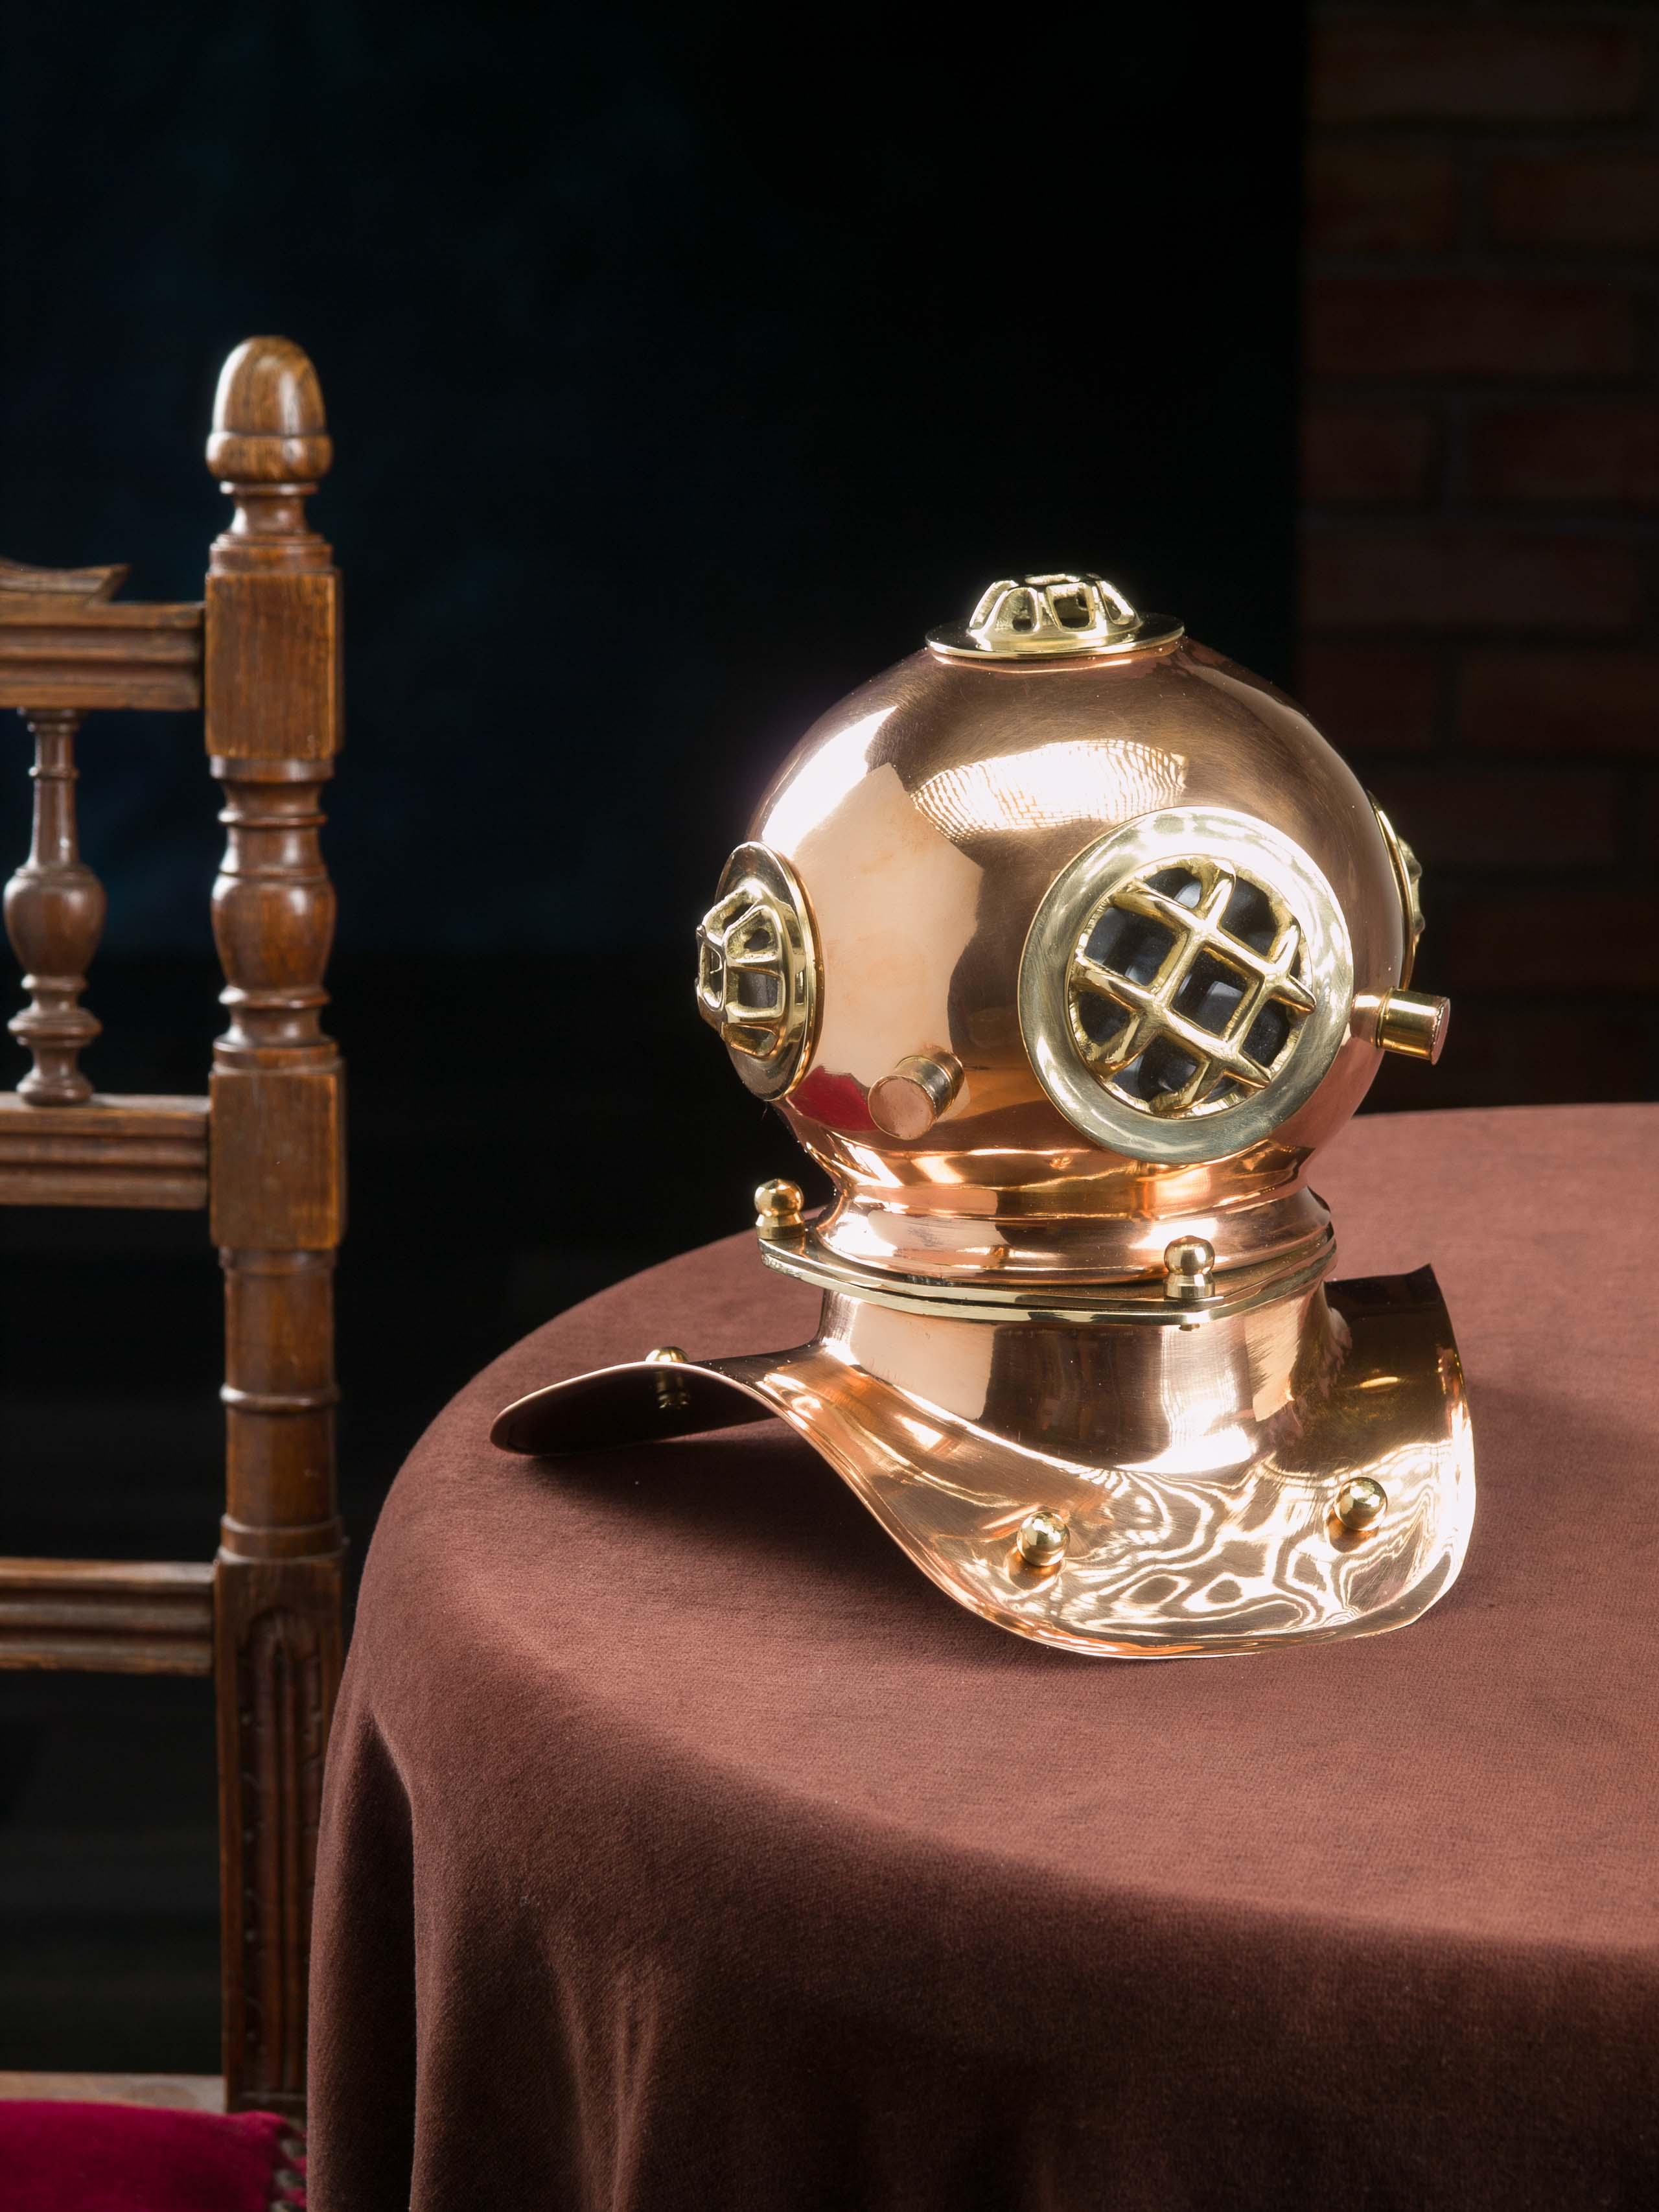 Taucherhelm Kupfer 20cm Maritim Taucherglocke Helm Antik-Stil